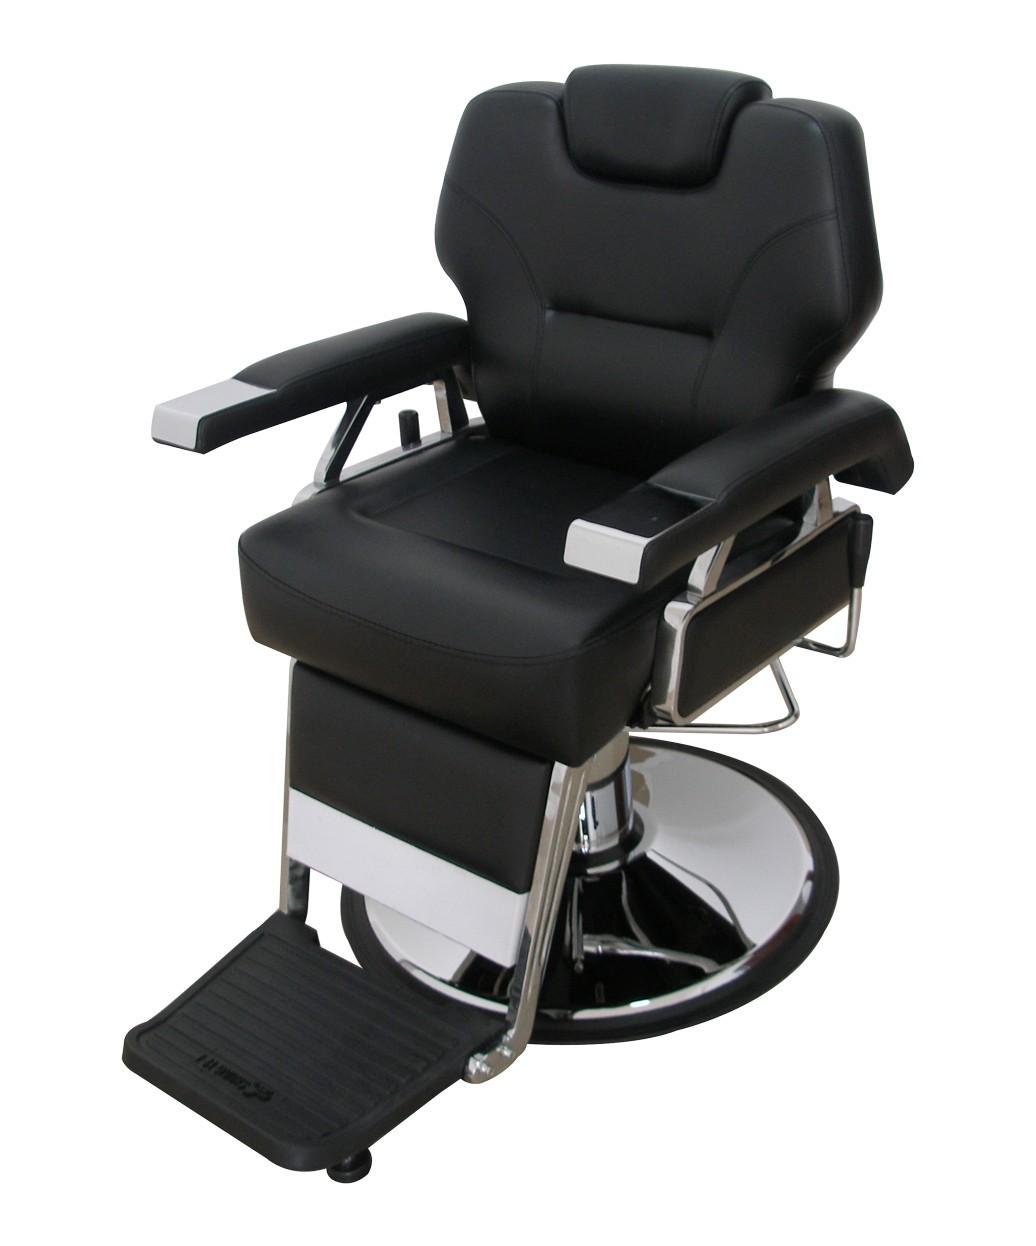 KO Professional Barber Chair